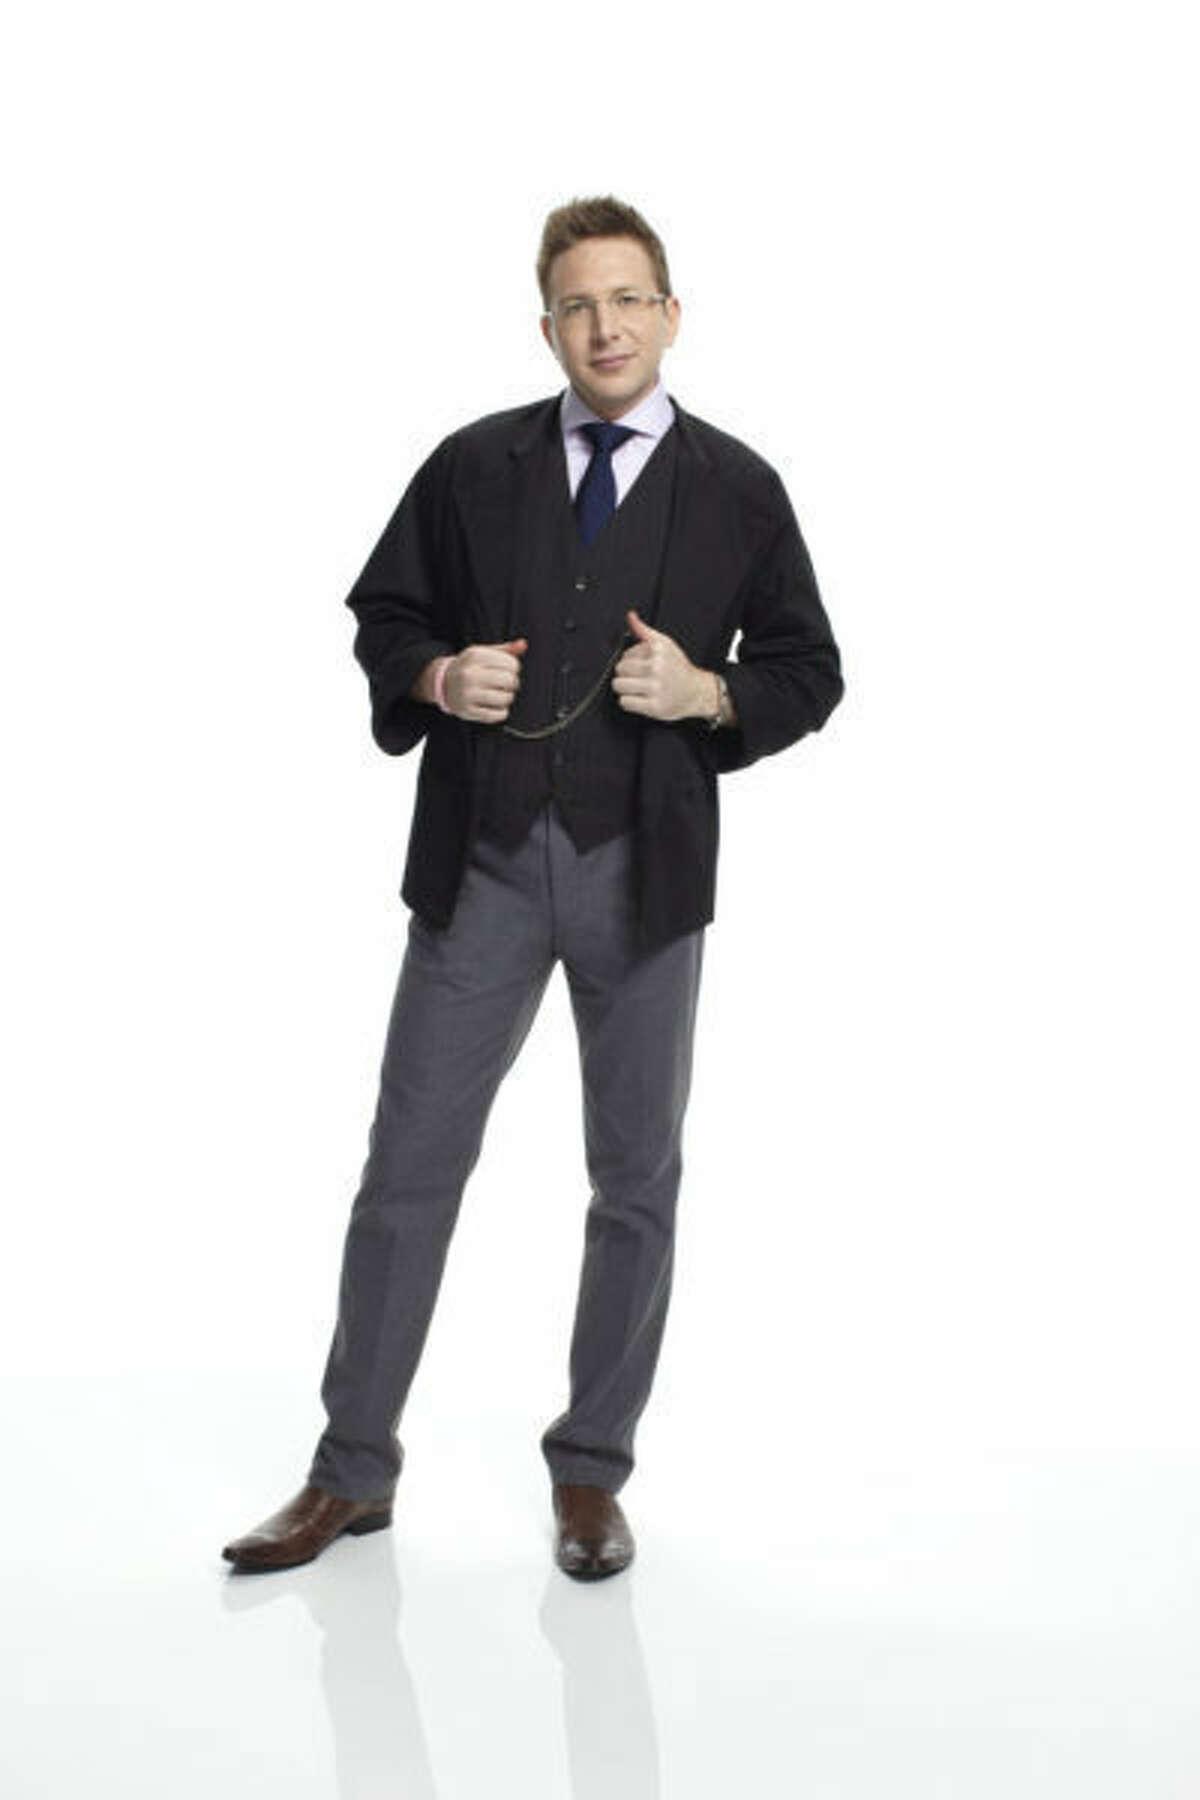 Stephen Asprinio, Season 1: One could call Stephen